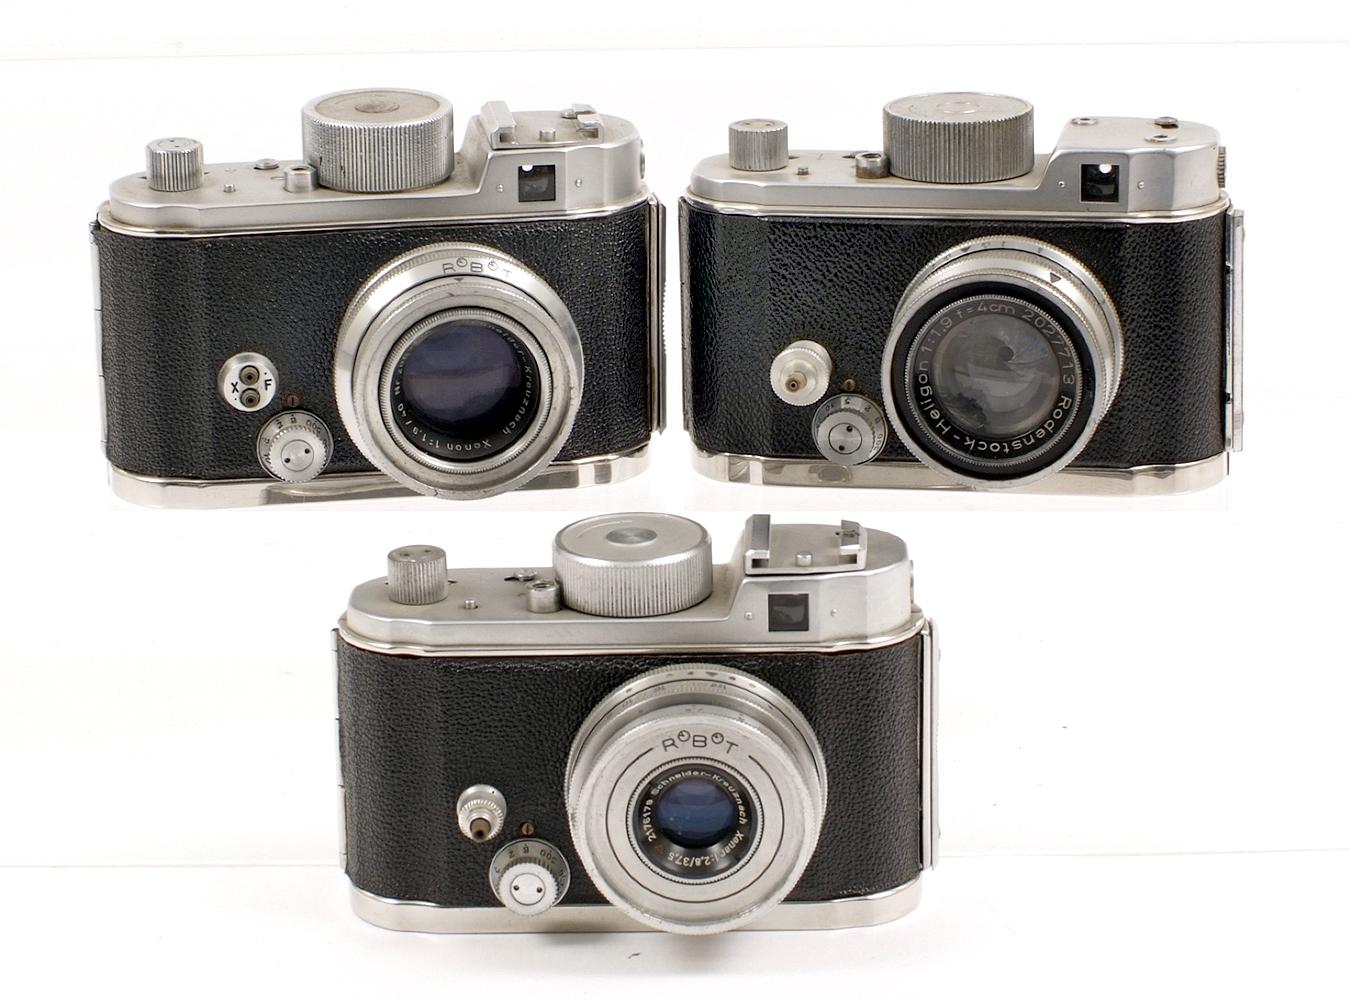 Lot 22 - Two Robot II & a Robot IIA Clockwork Cameras. #B93861 (working) with Xenar 37.5mm f2.